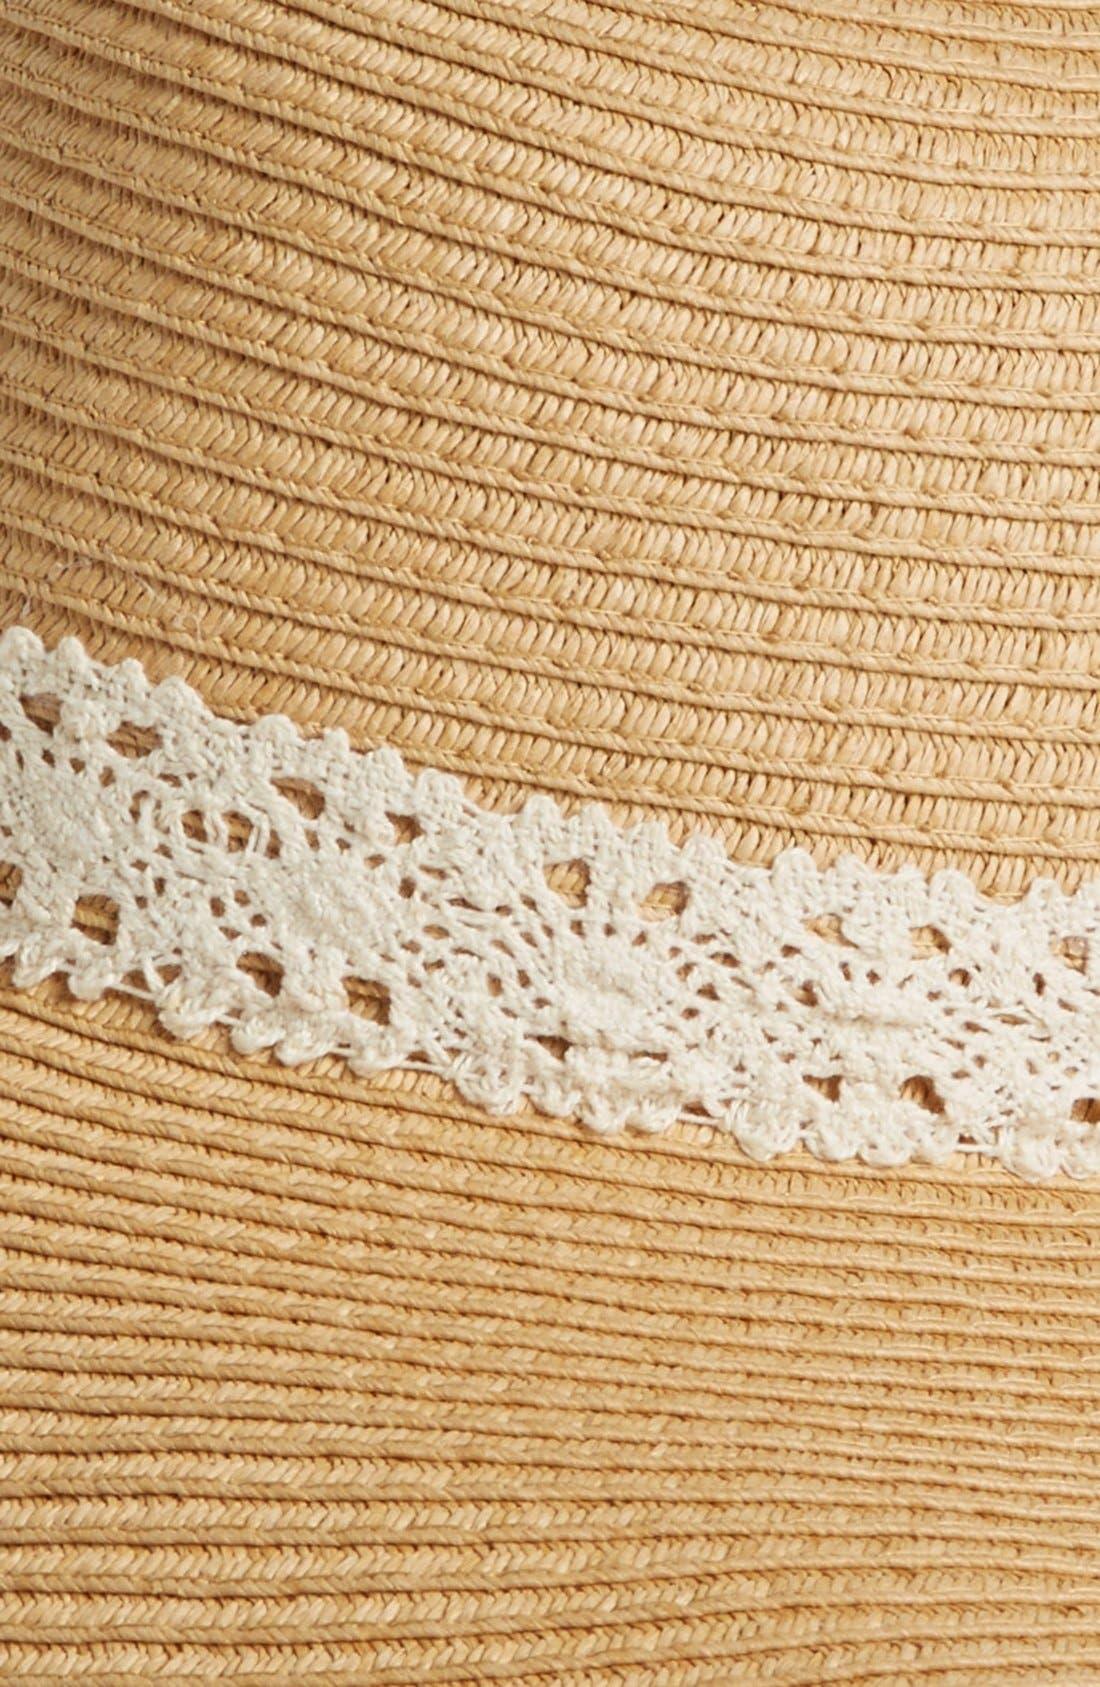 Alternate Image 2  - Amici Accessories Crochet Band Floppy Straw Hat